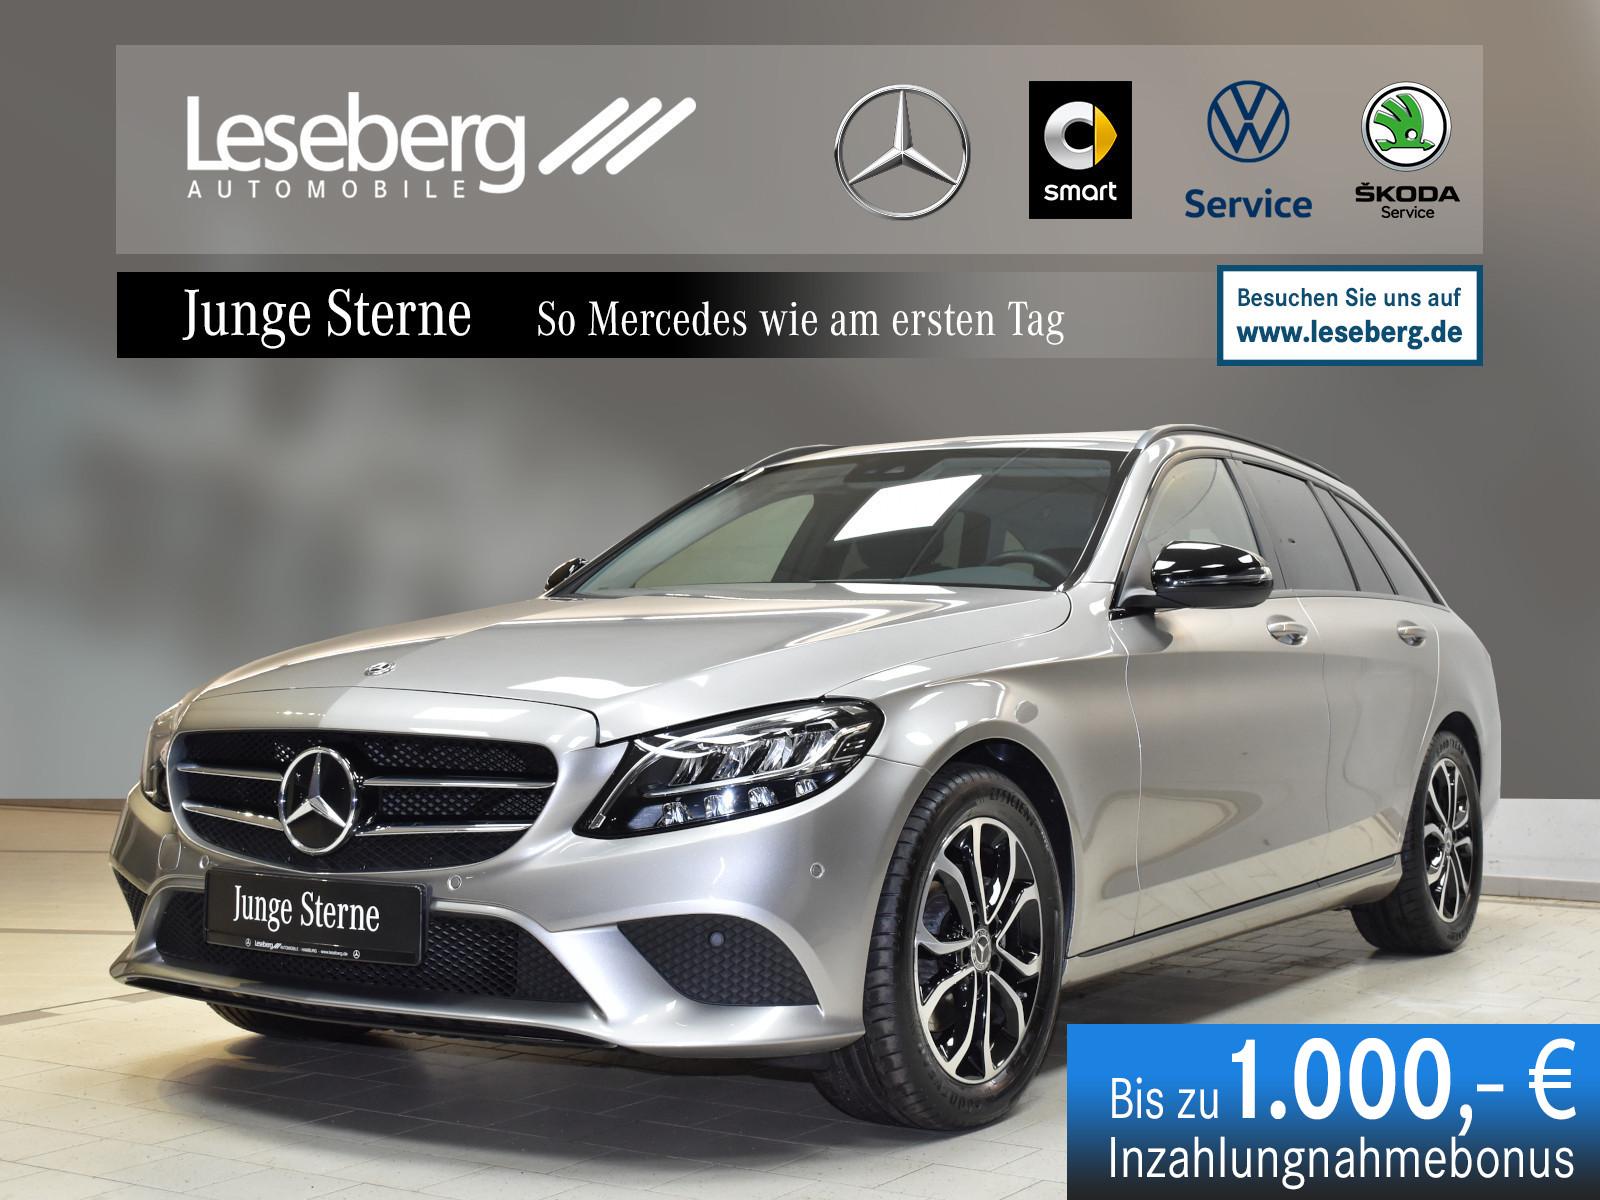 Mercedes-Benz C 200 d T Avantgarde/Night/Kamera/LED/9G/Navi, Jahr 2019, Diesel